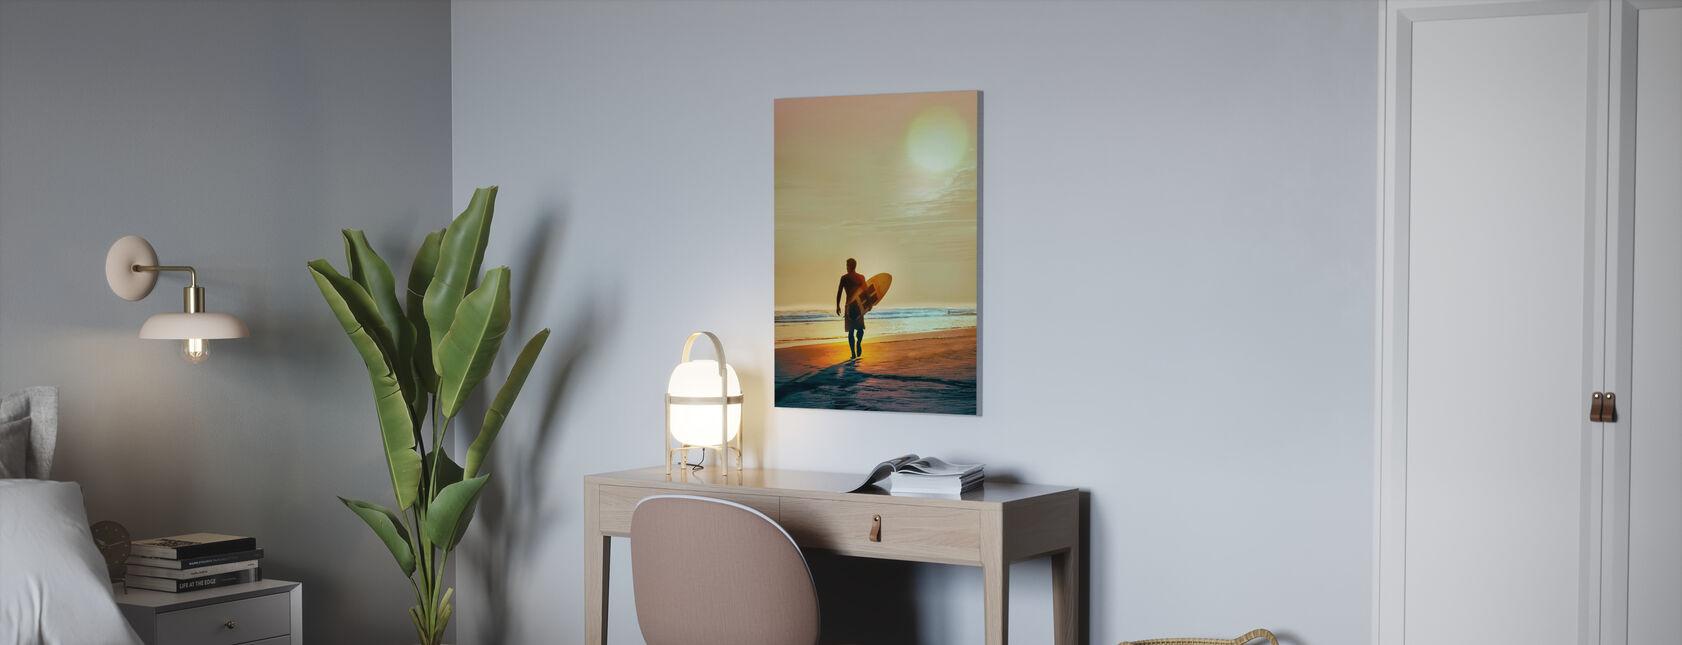 Sunset Surfer - Canvas print - Office